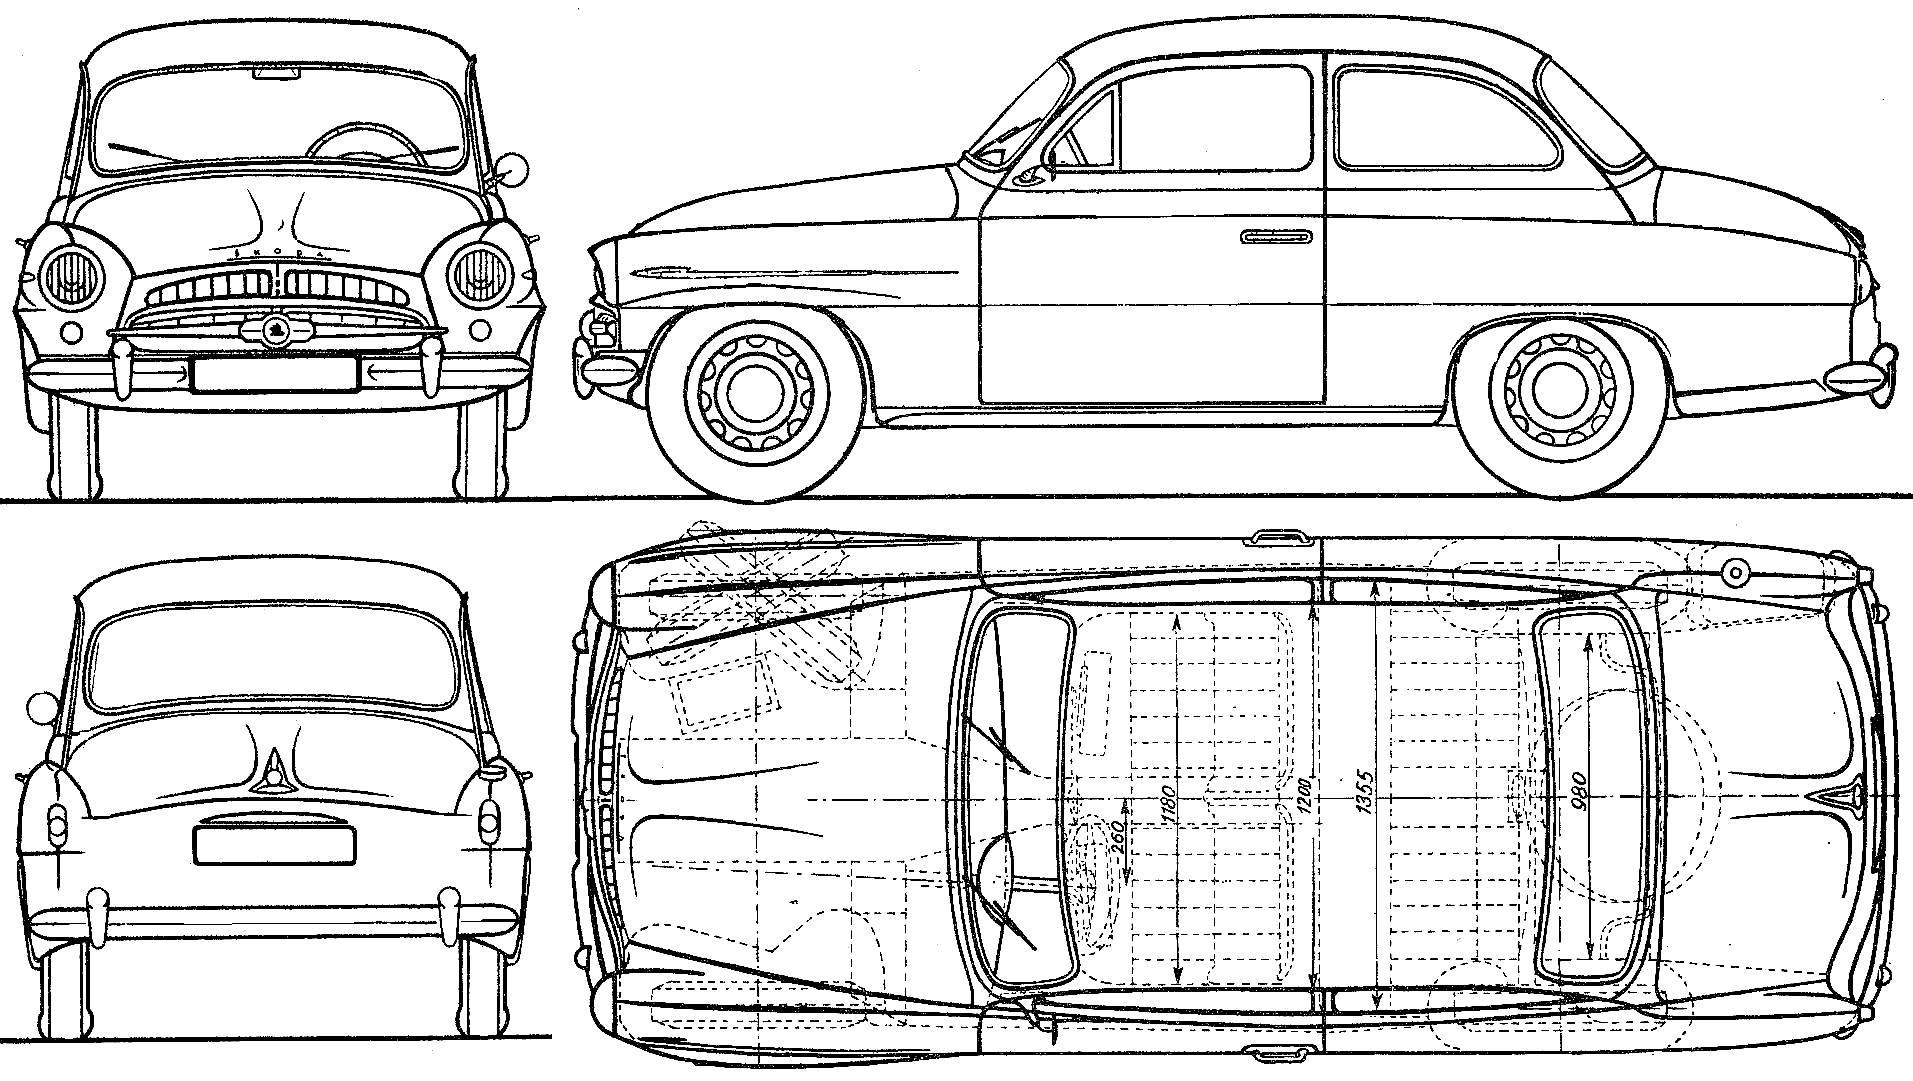 1957 skoda 440 sedan blueprints free